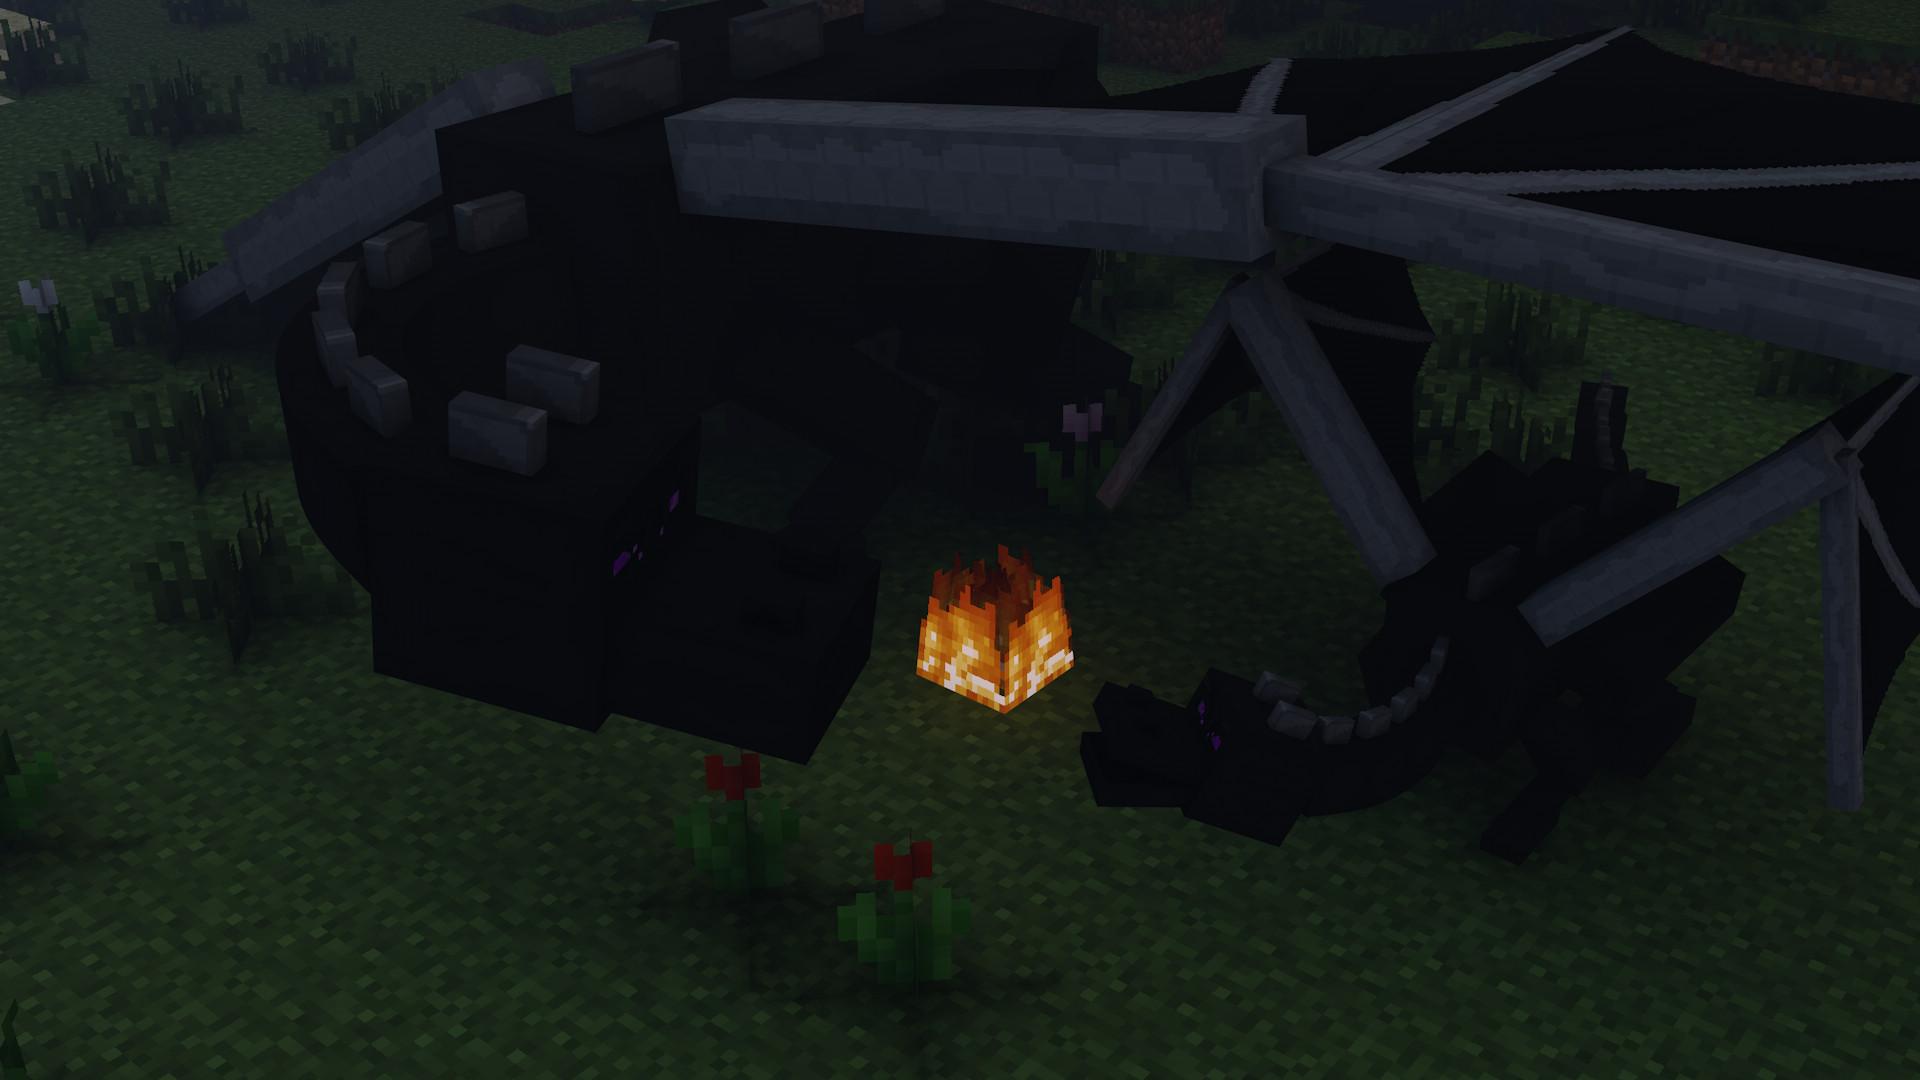 Res: 1920x1080, Gry Wideo - Minecraft Smok Ender Dragon Mojang Tapeta